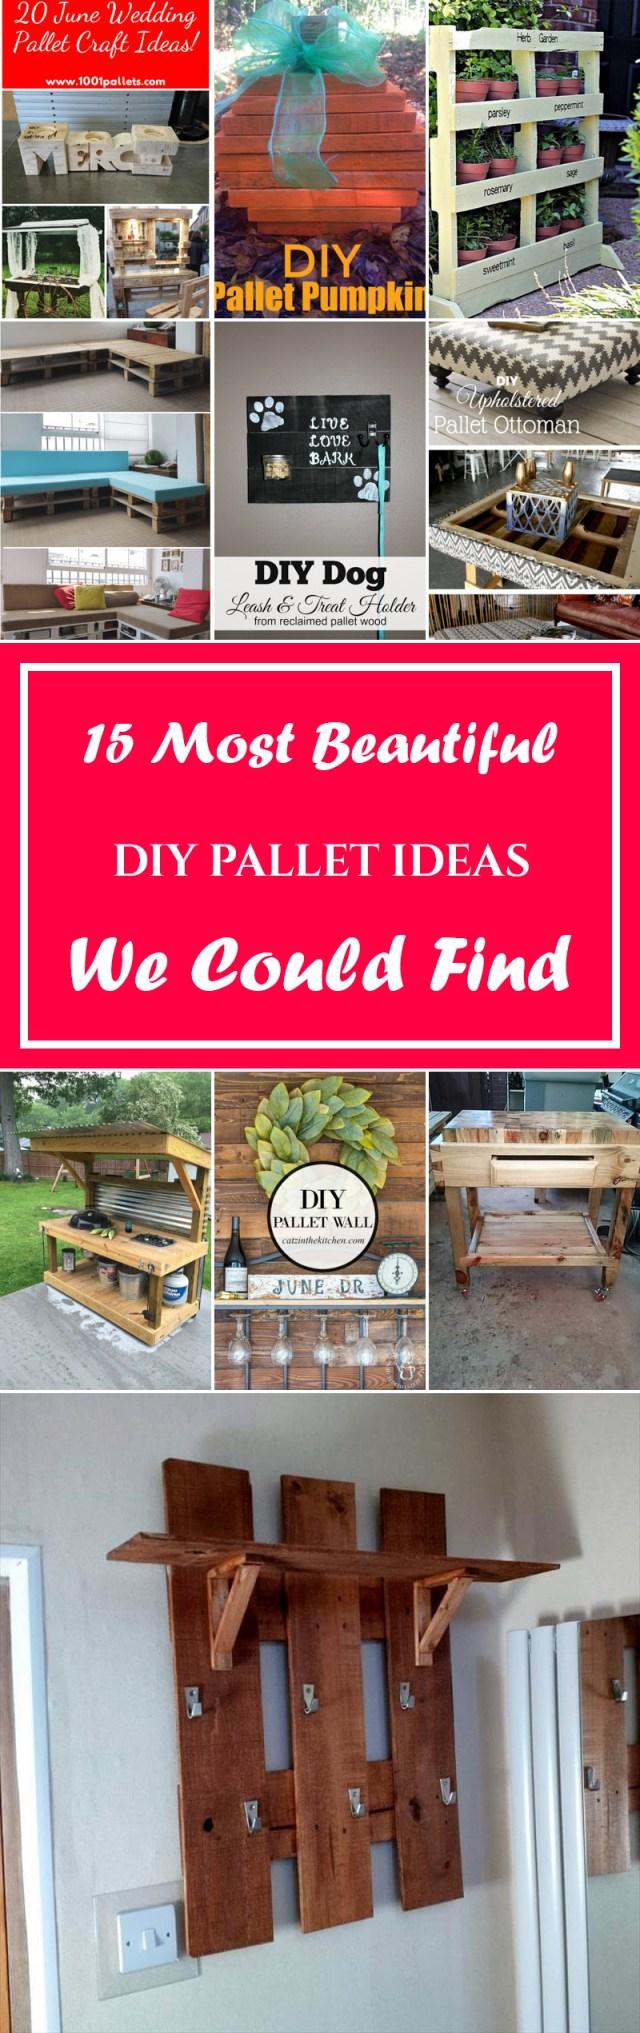 Wedding Pallet Ideas 15 Most Beautiful Diy Pallet Ideas We Could Find Listvi